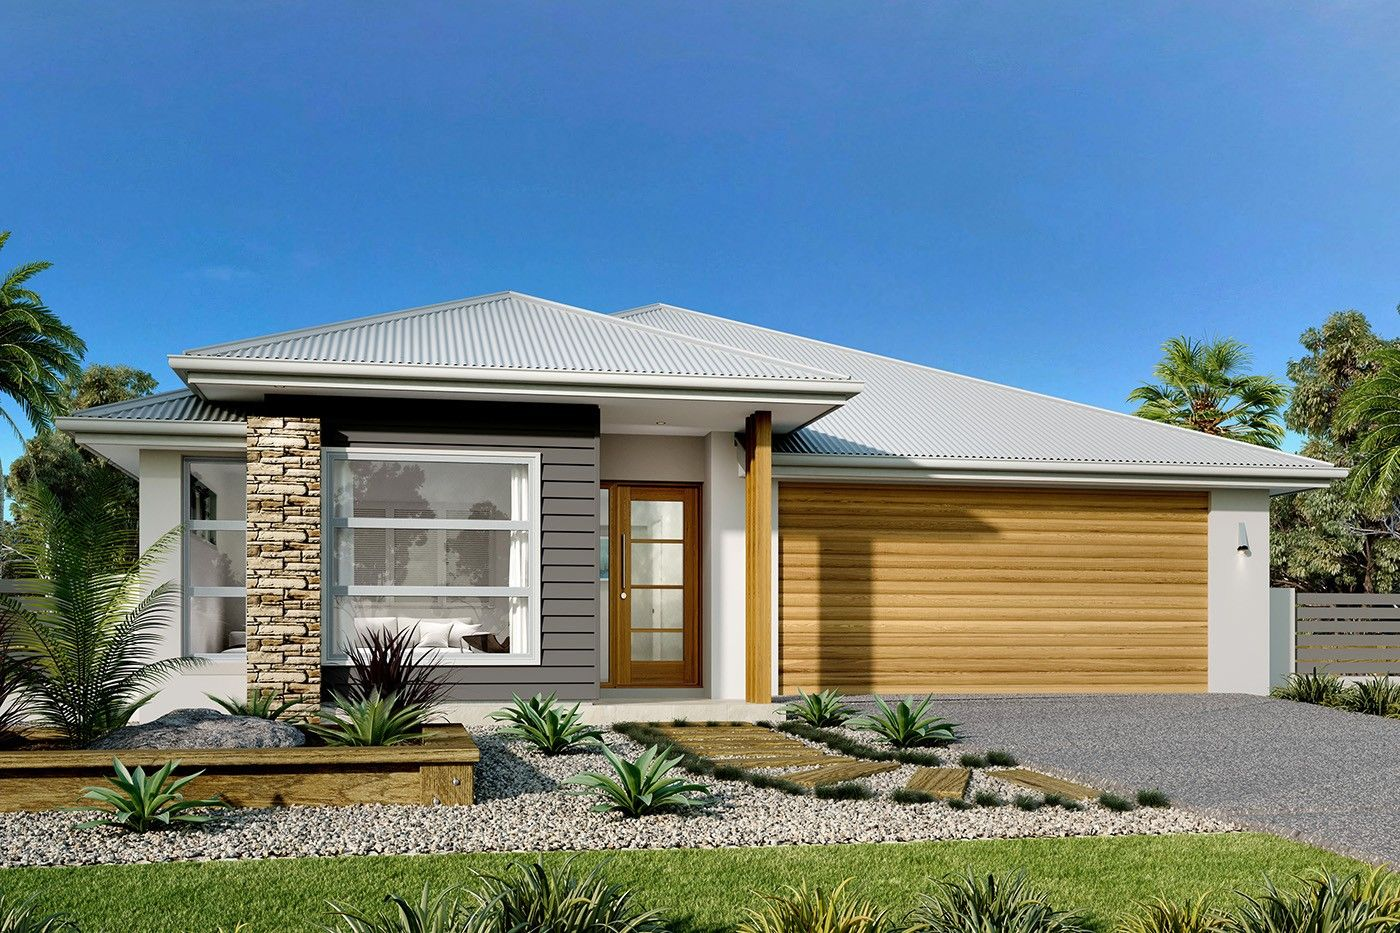 Lot 1246 Everleigh Estate, Greenbank QLD 4124, Image 0